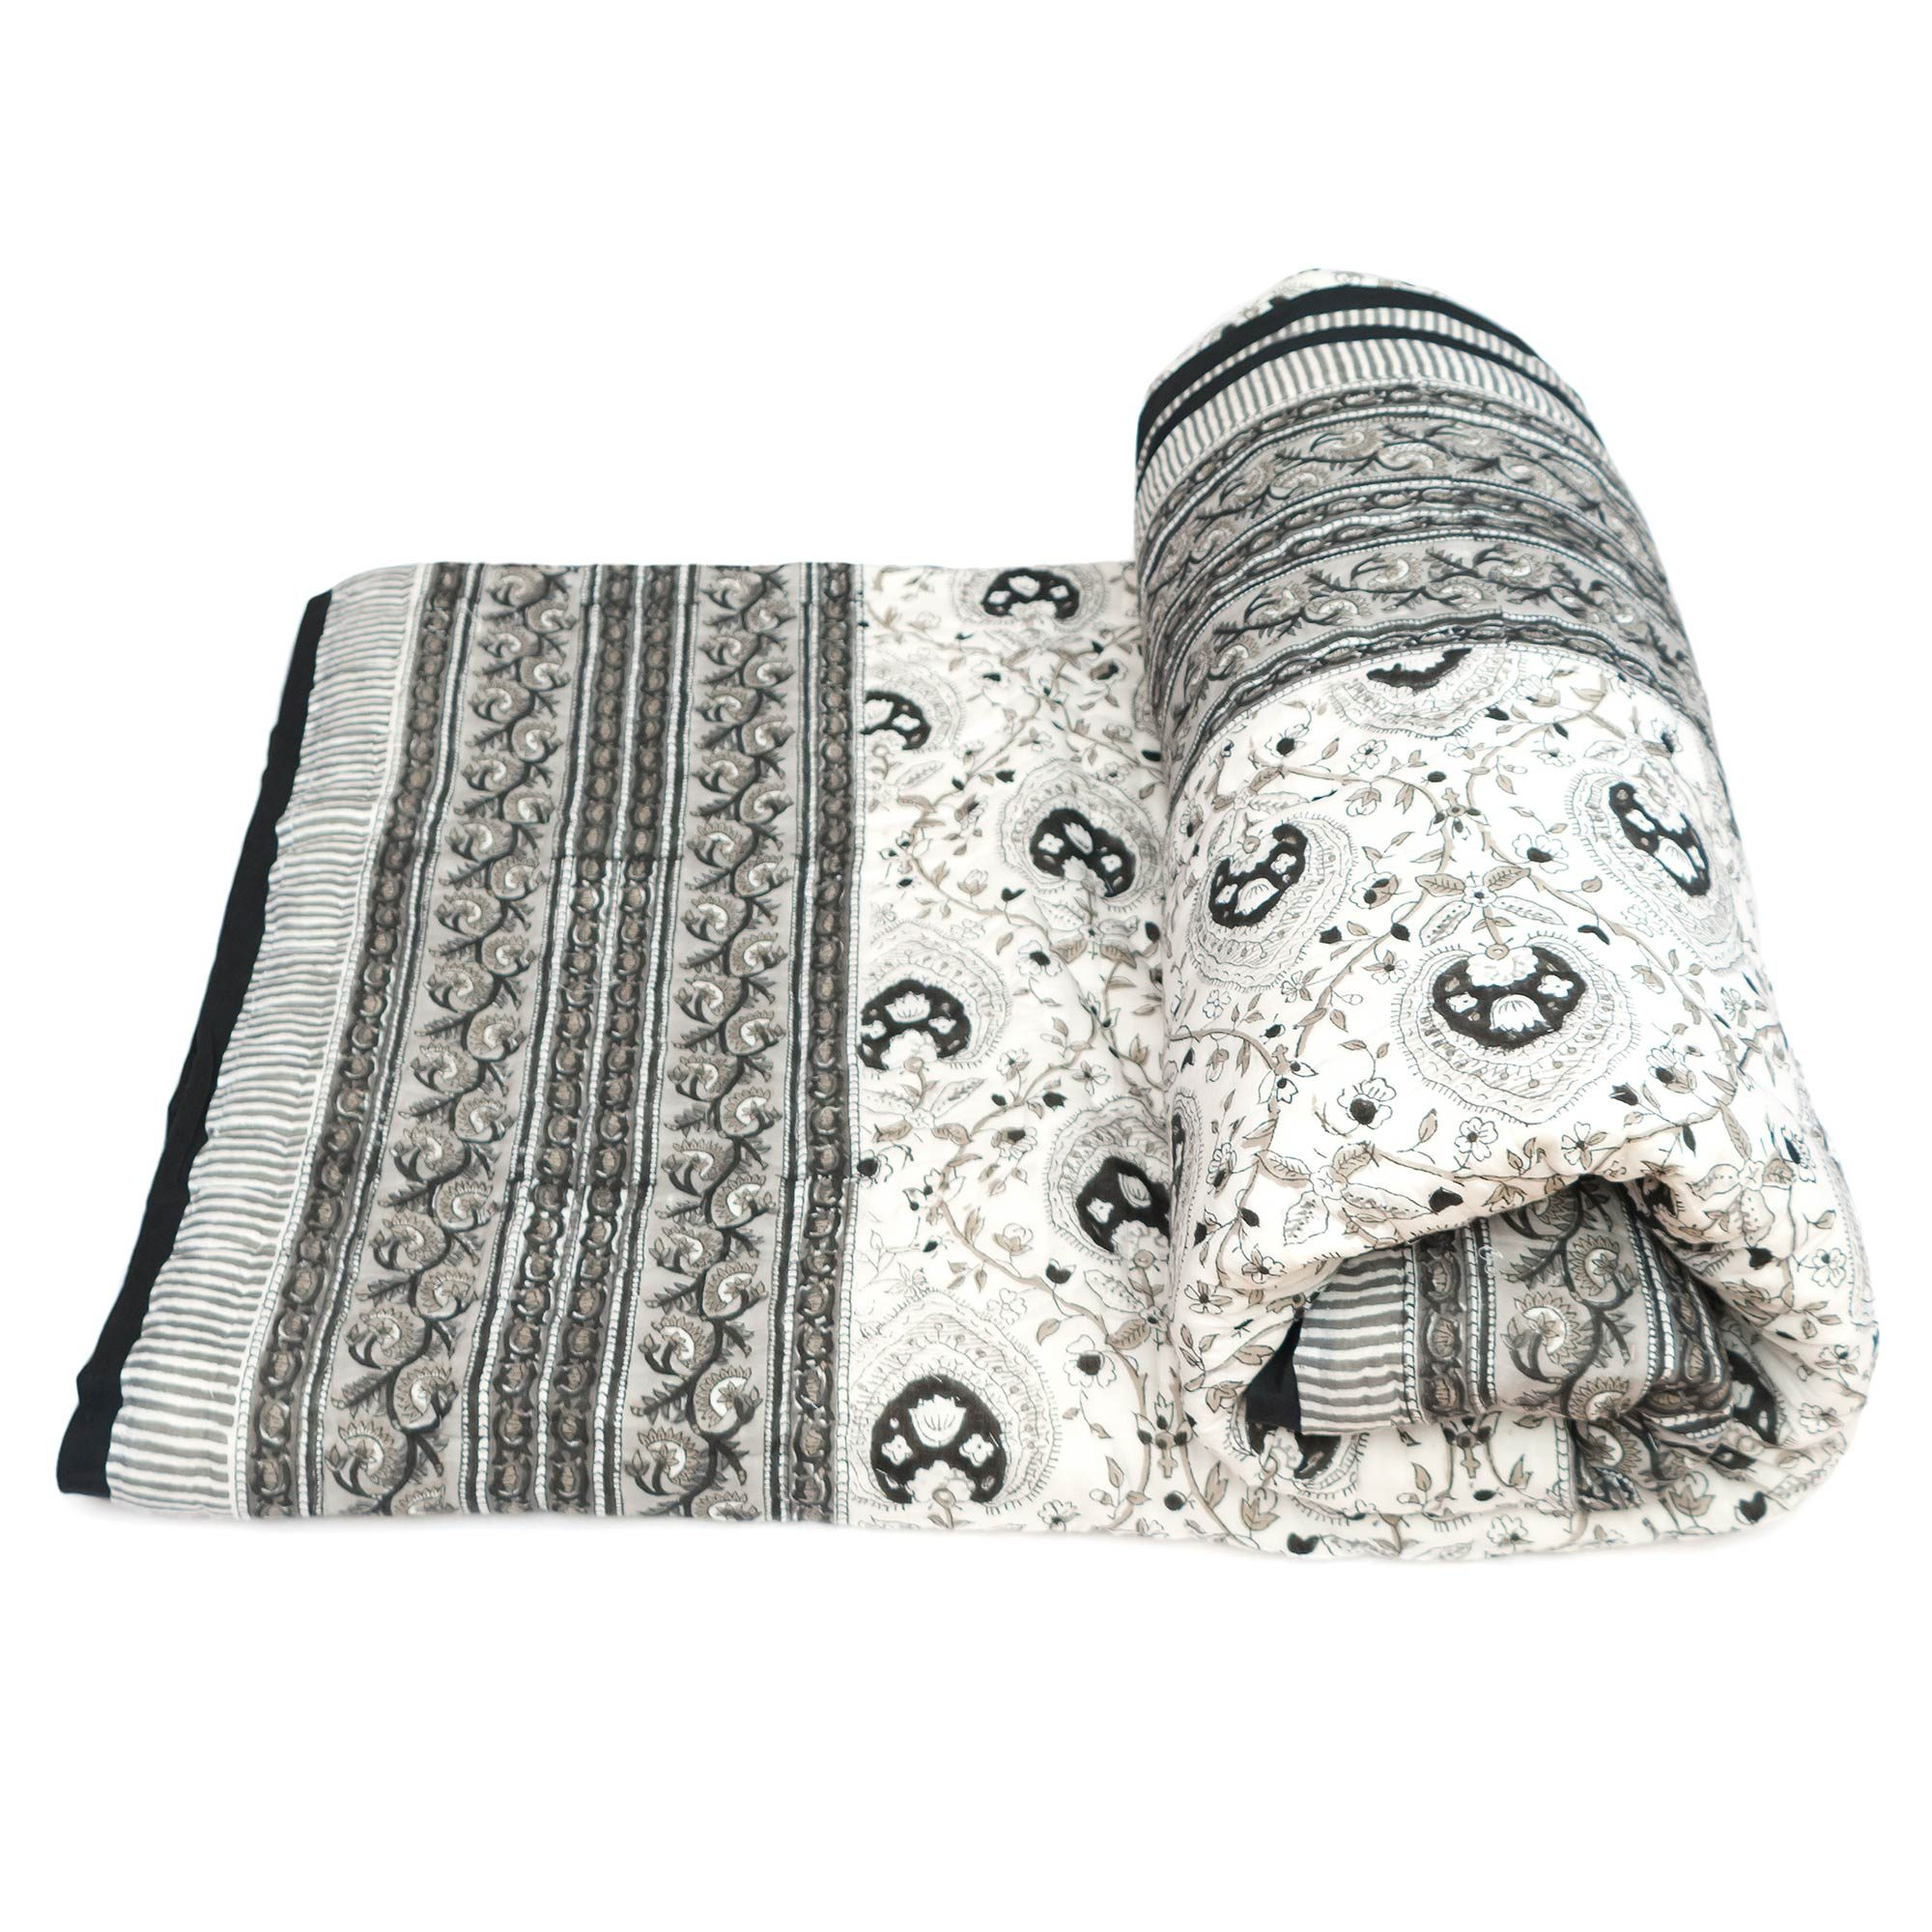 Tara-Textile - indische Decke - Kuscheldecke Vanita